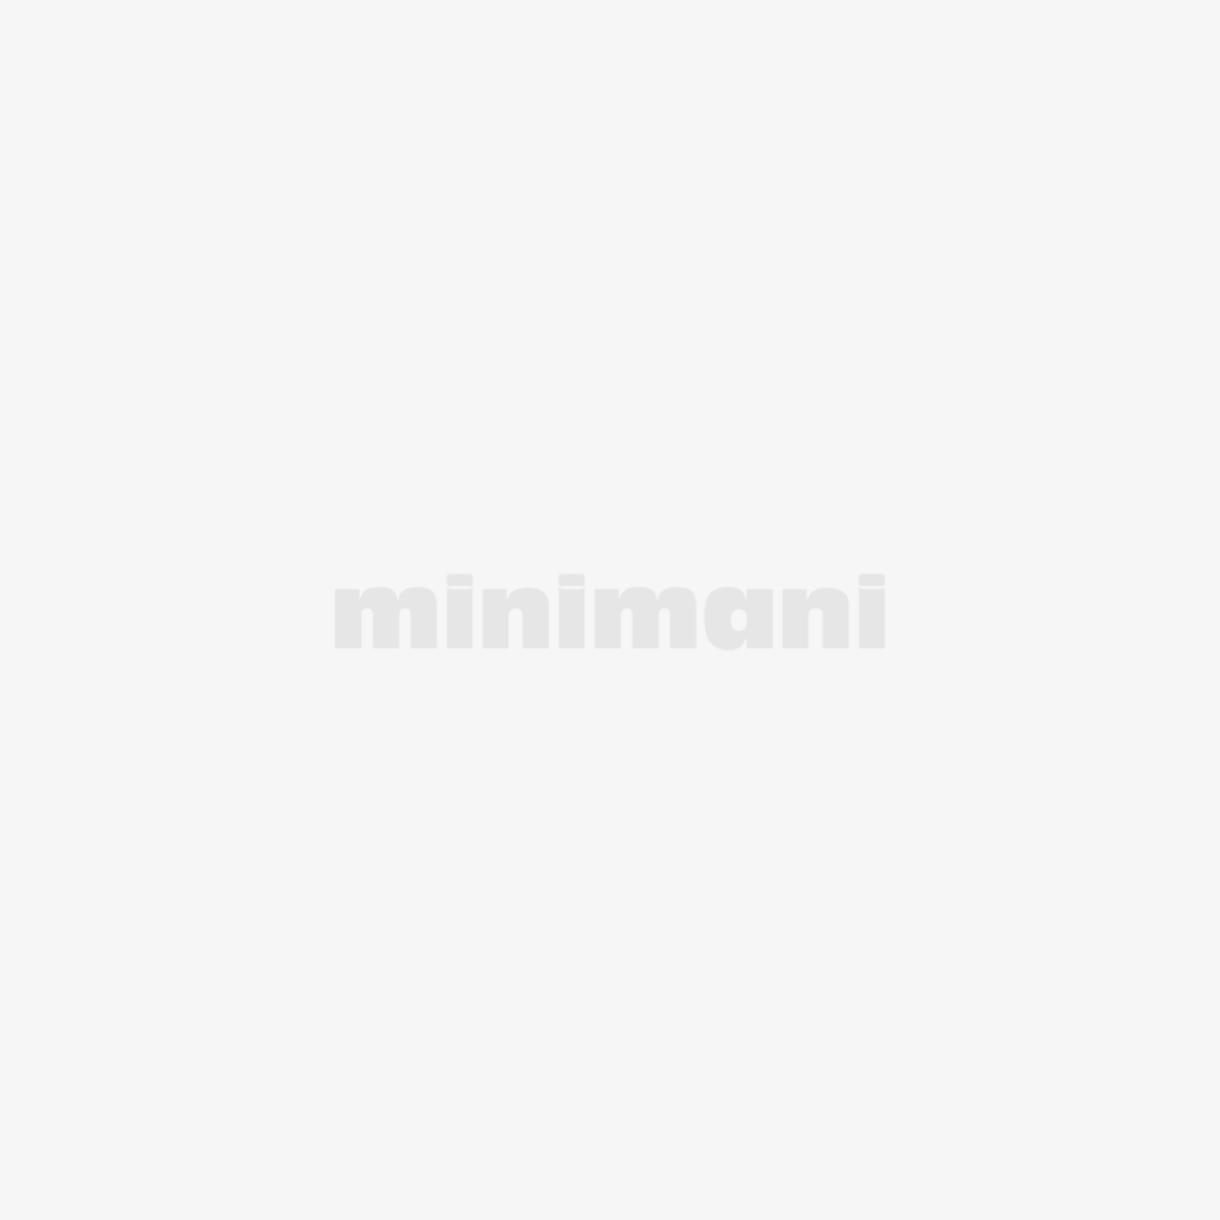 Vallila valmisverho 140x240cm, Naimakauppa valk/pun